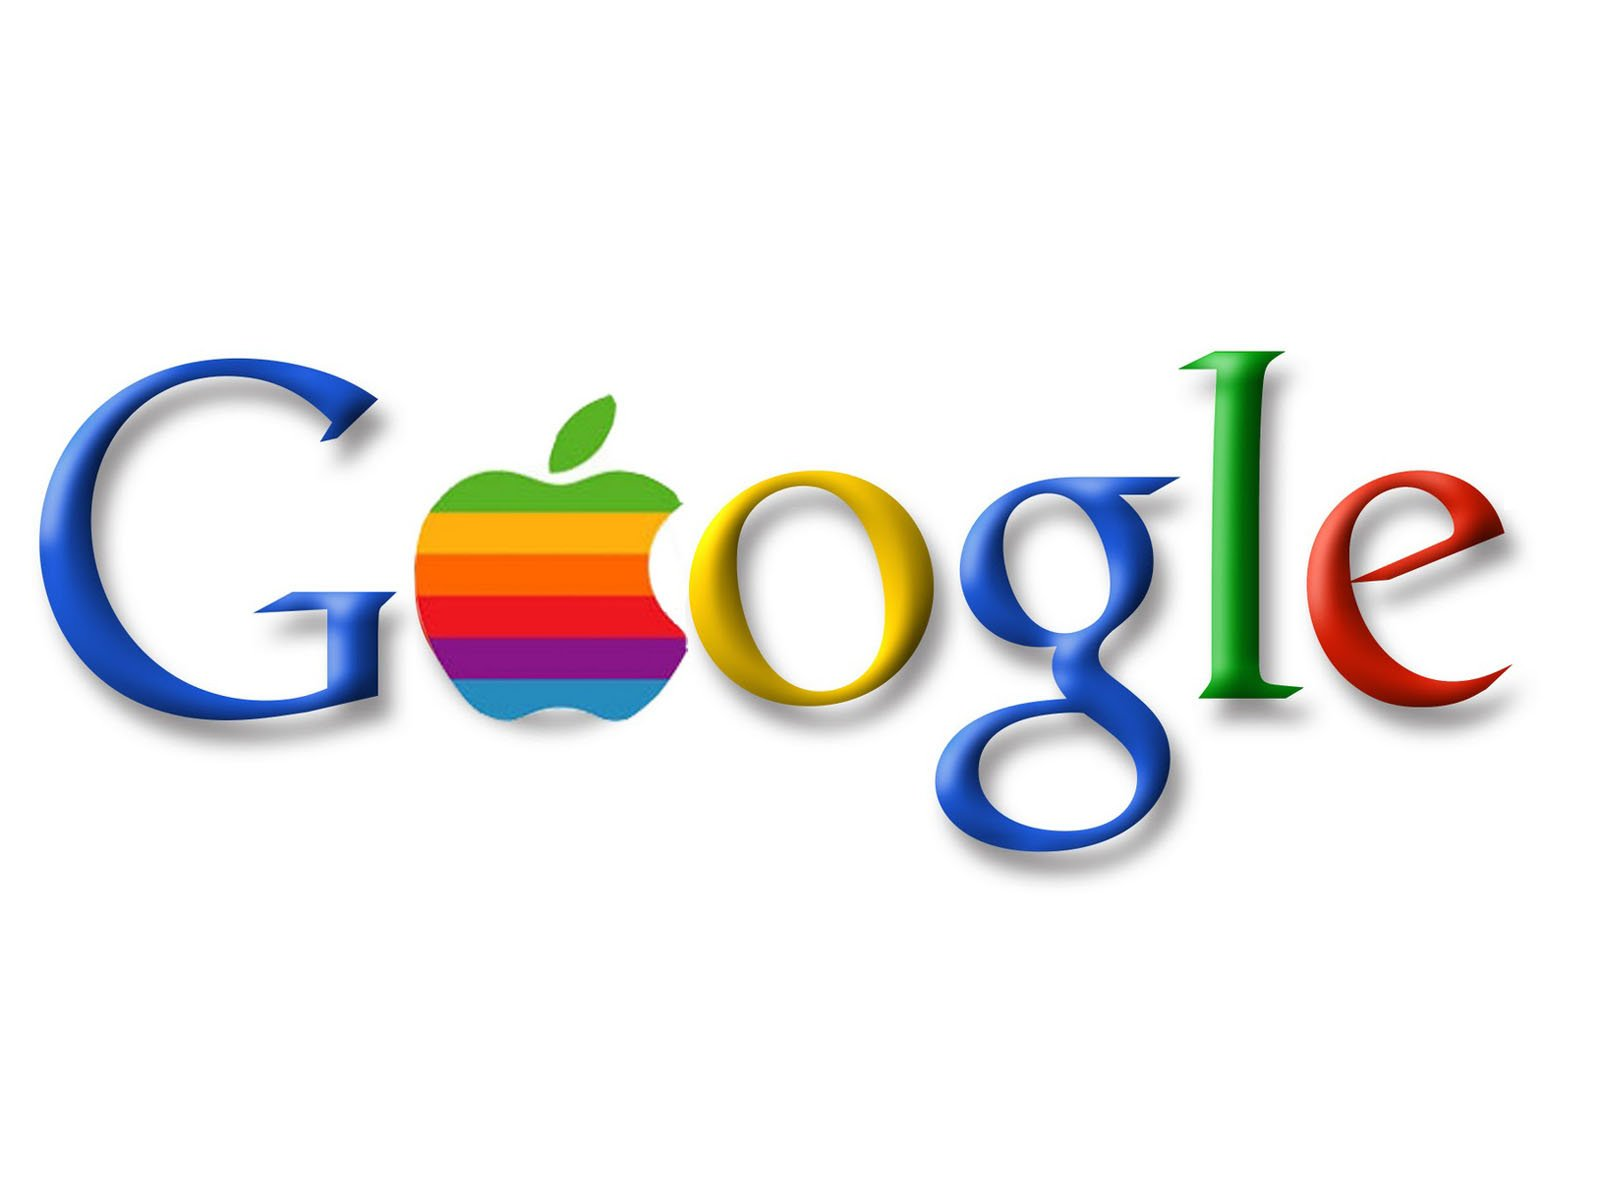 desktop backgrounds google cool google wallpapers hd google wallpapers 1600x1200